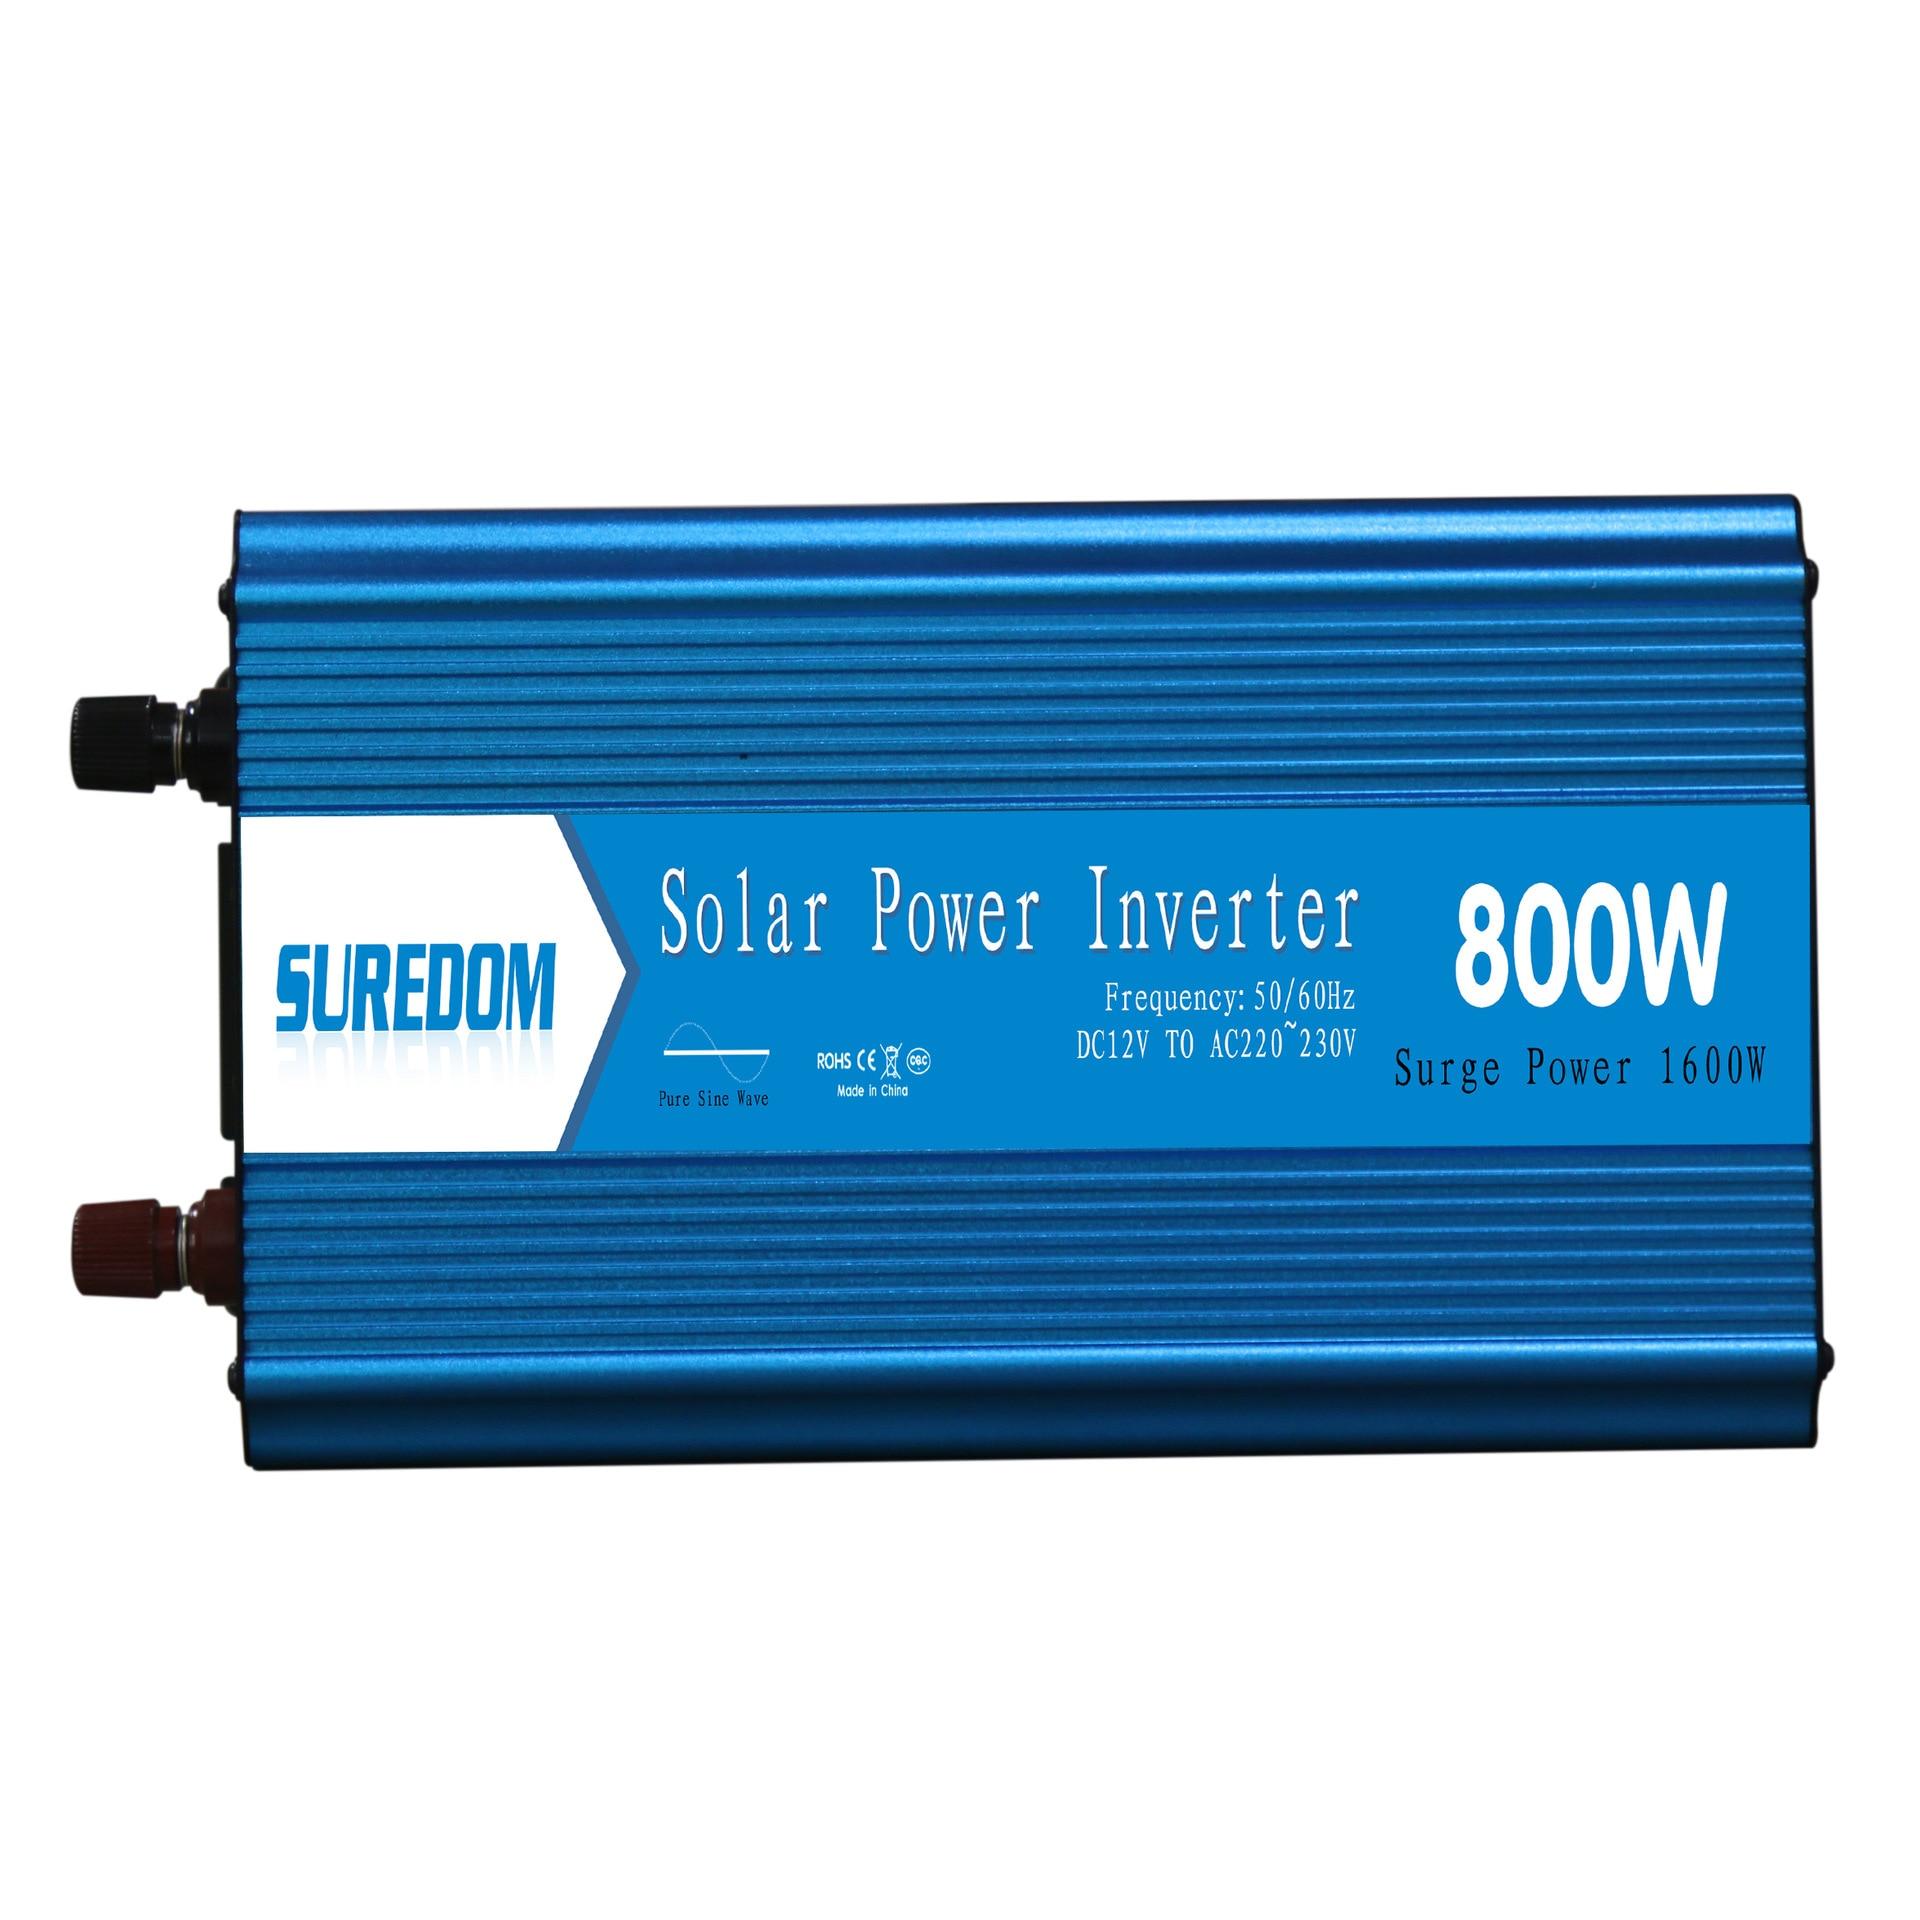 800W Pure Sinusoidal Inverter Solar Inverter Multifunctional Travel Power Supply Control Car power inverter 2 universal